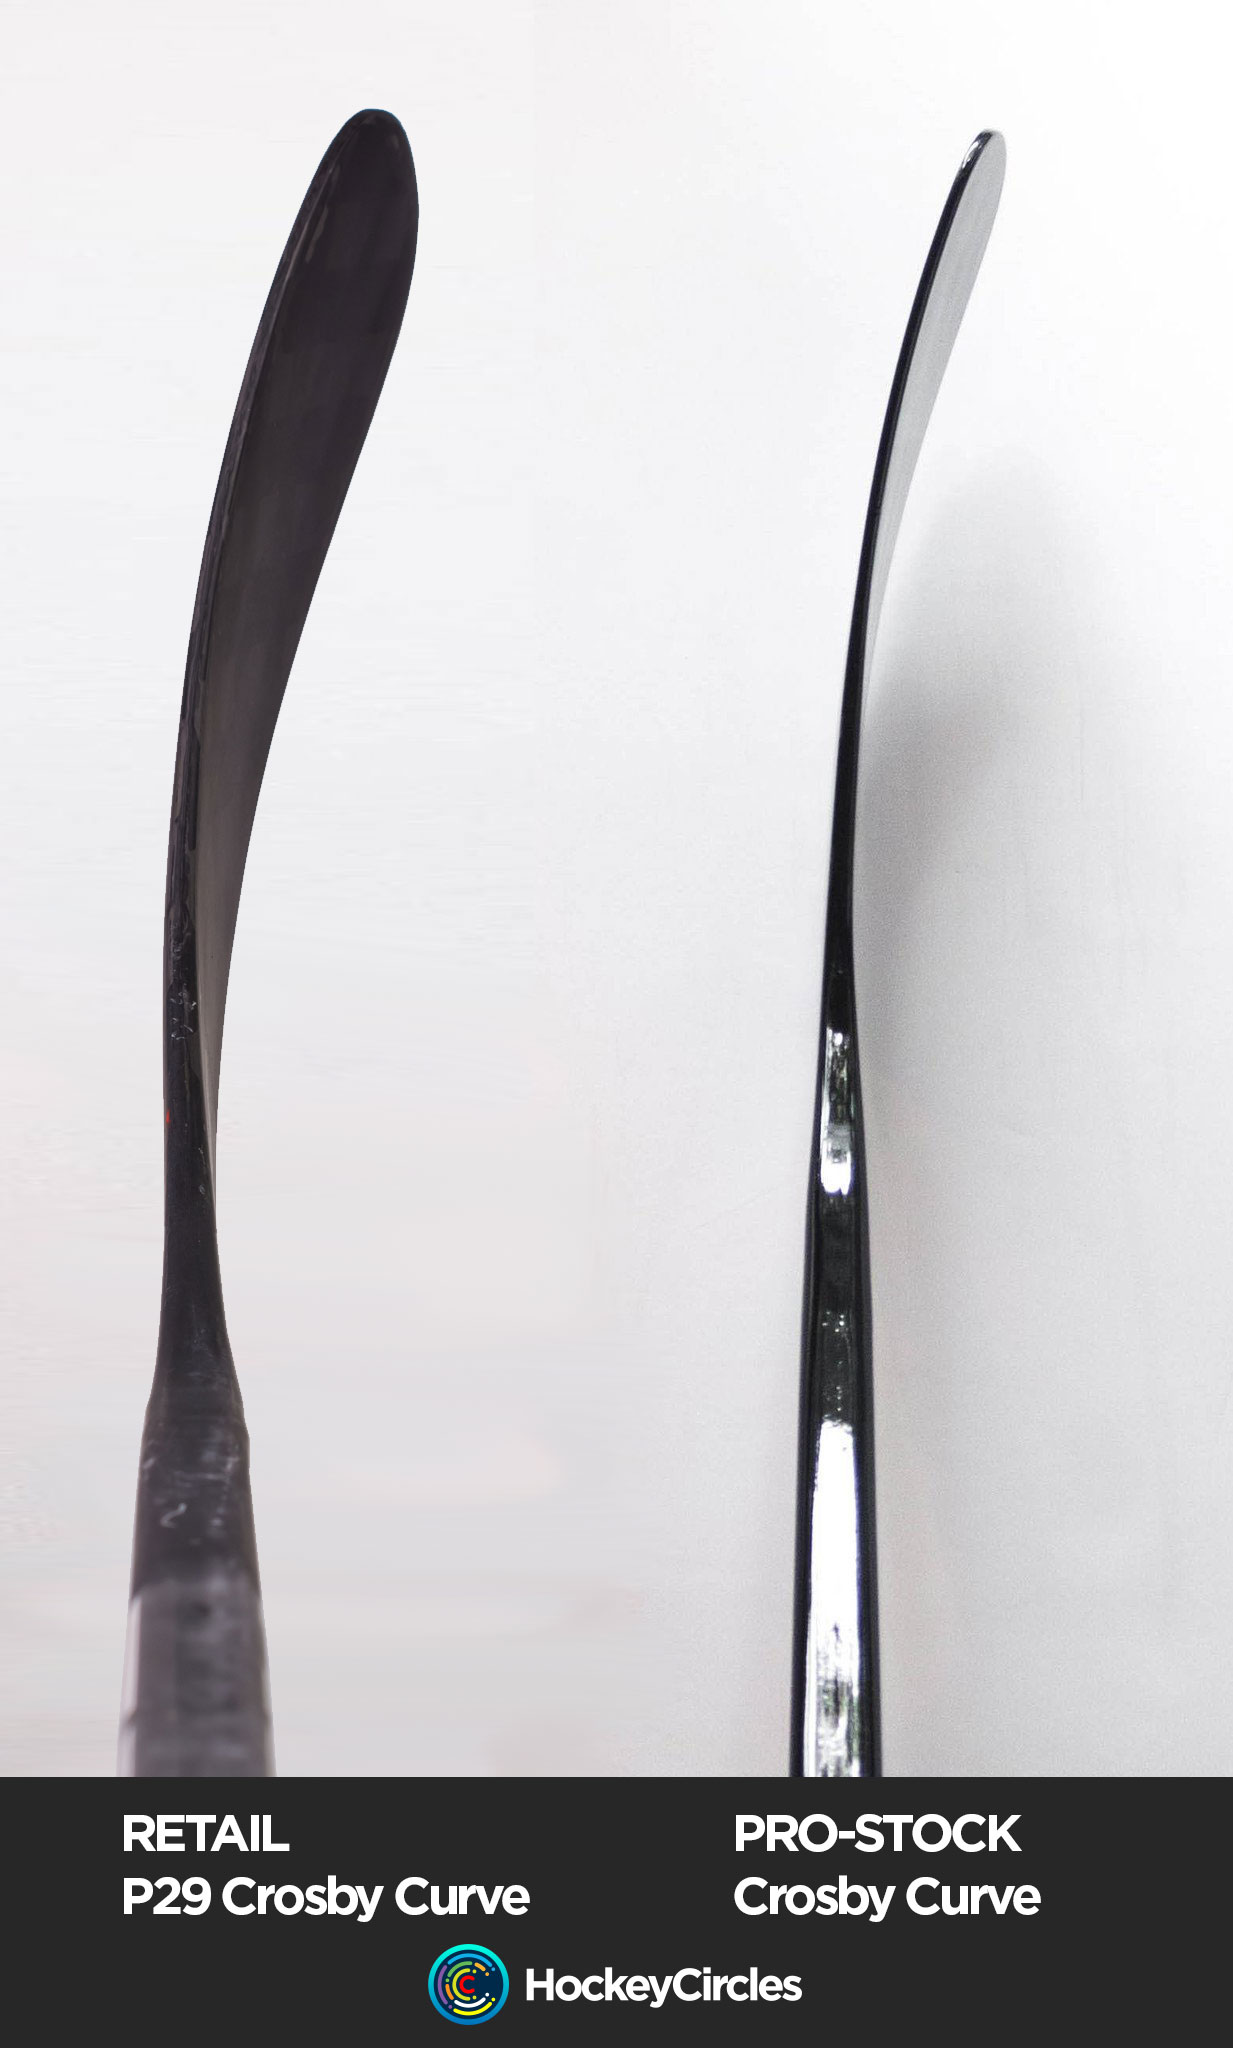 Prostock v Retail Crosby P29 curve pattern